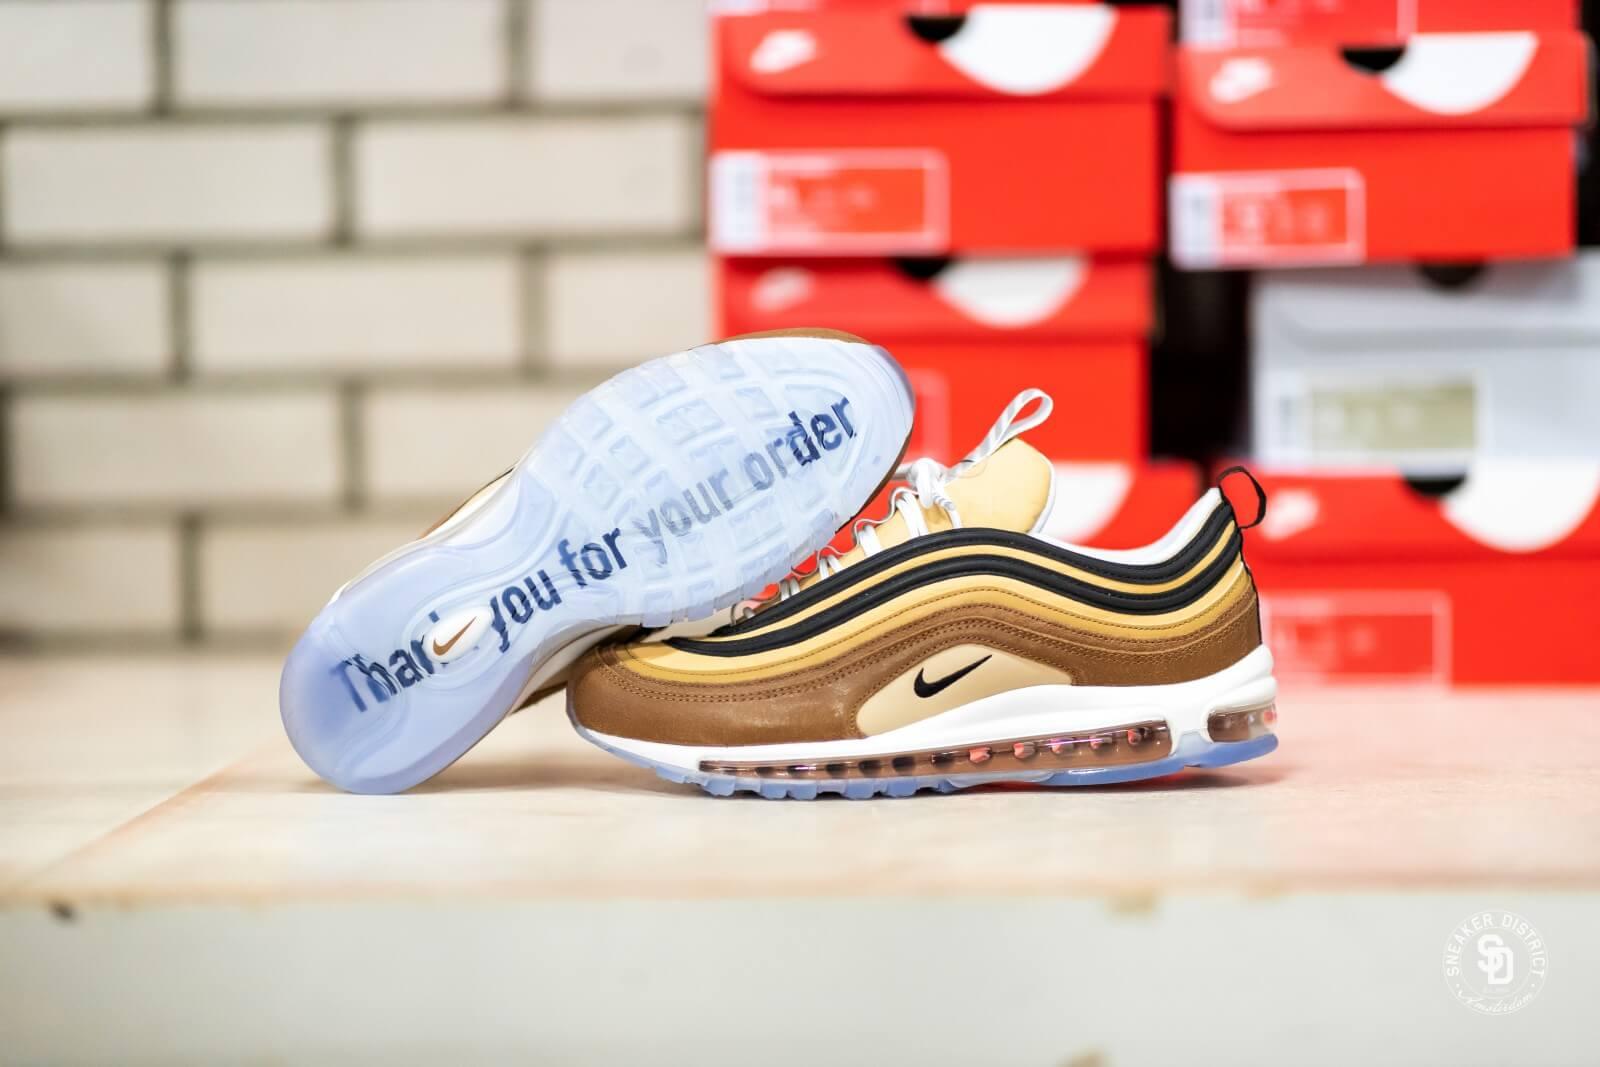 Nike Air Max 97 Shipping Box Ale BrownBlack Elemental Gold 921826 201